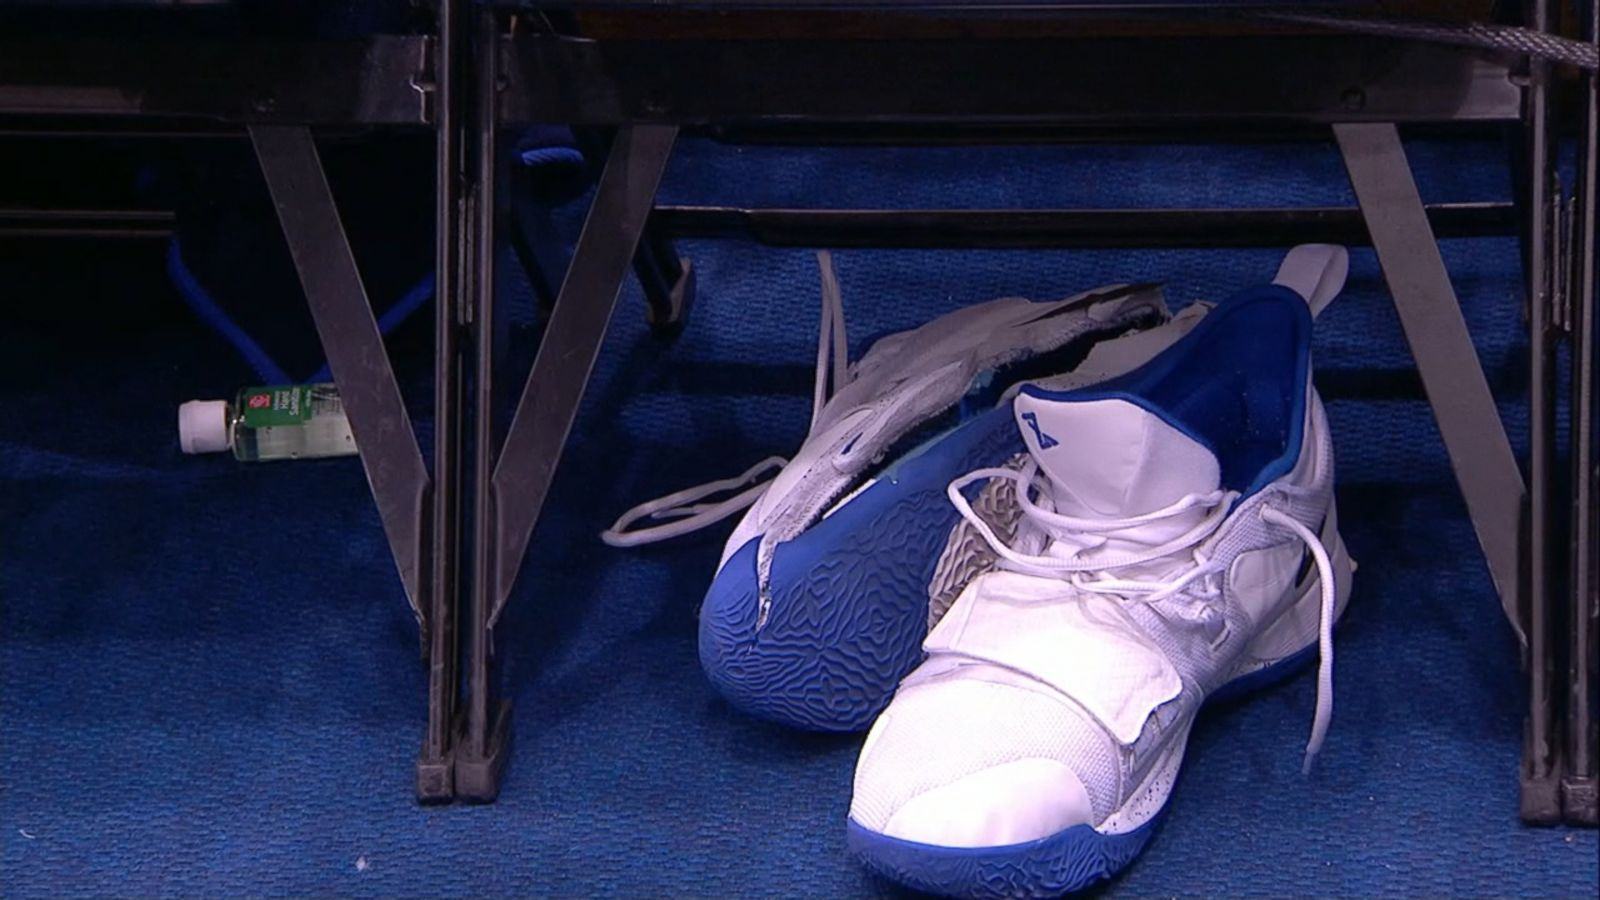 02f4dcf7240 Nike promises to investigate why Duke star Zion Williamson s shoe ...